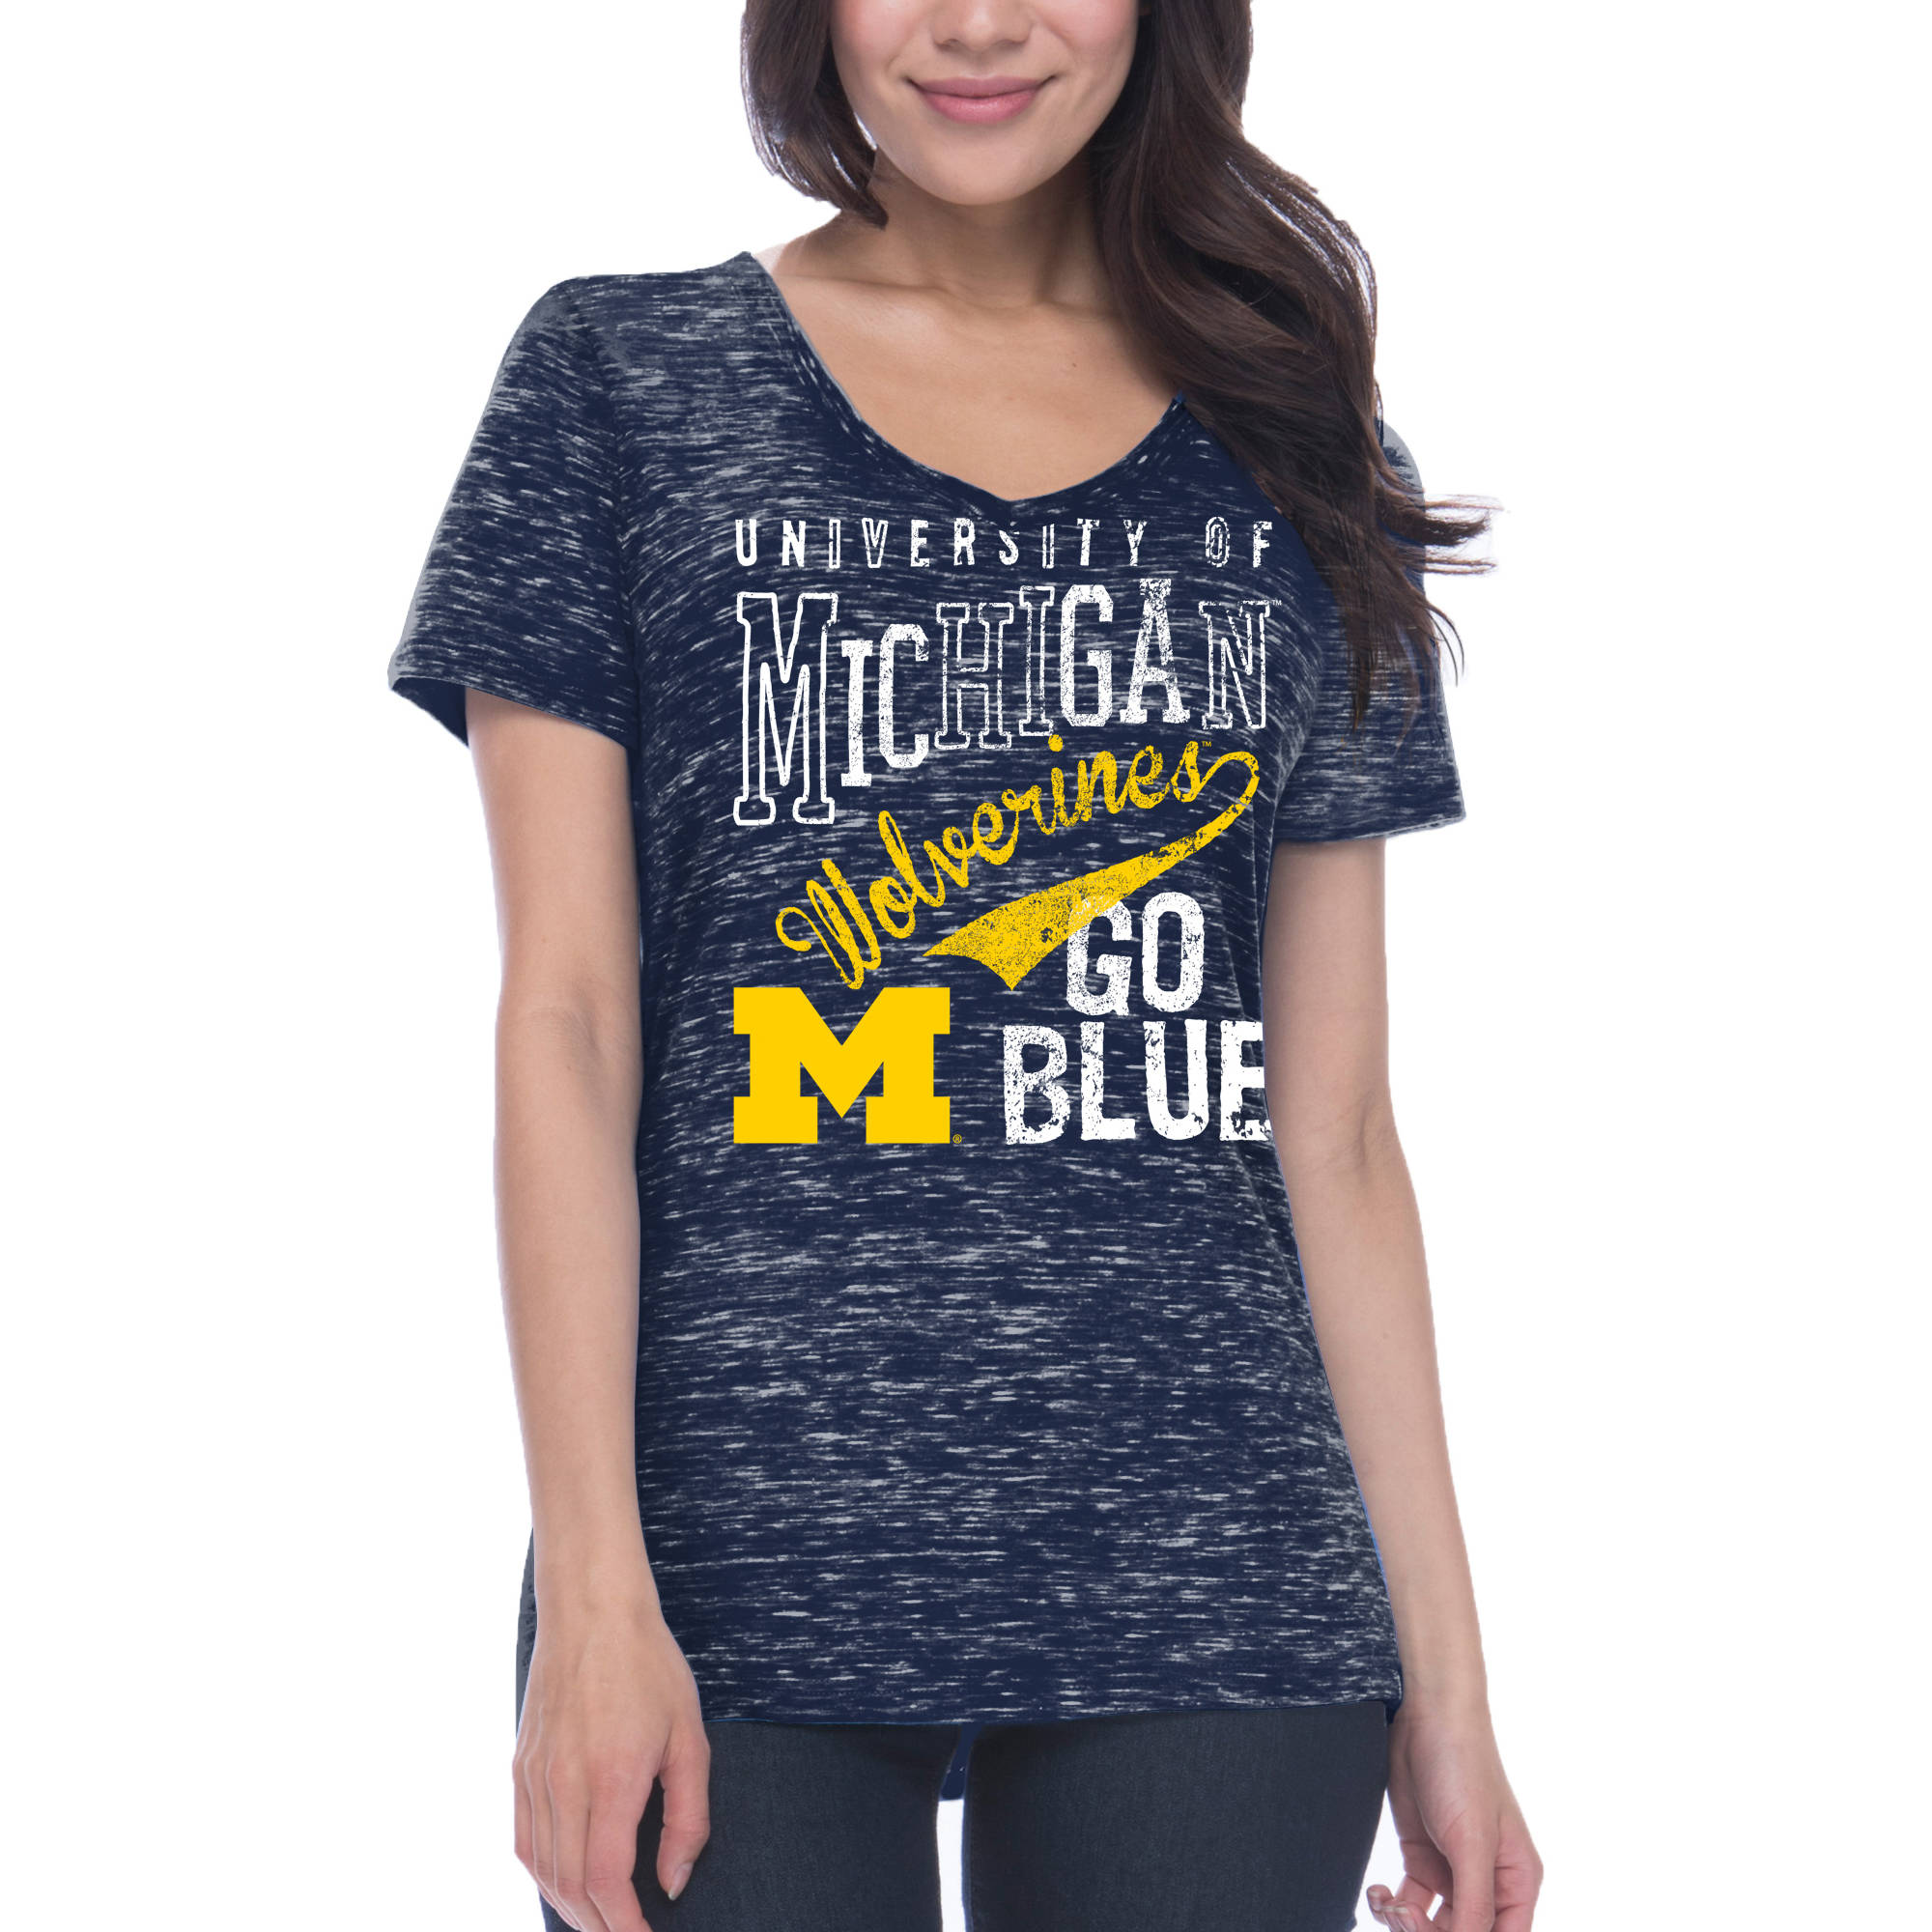 NCAA Michigan Wolverines Women's Junior Fit Short Sleeve V Neck T-shirt